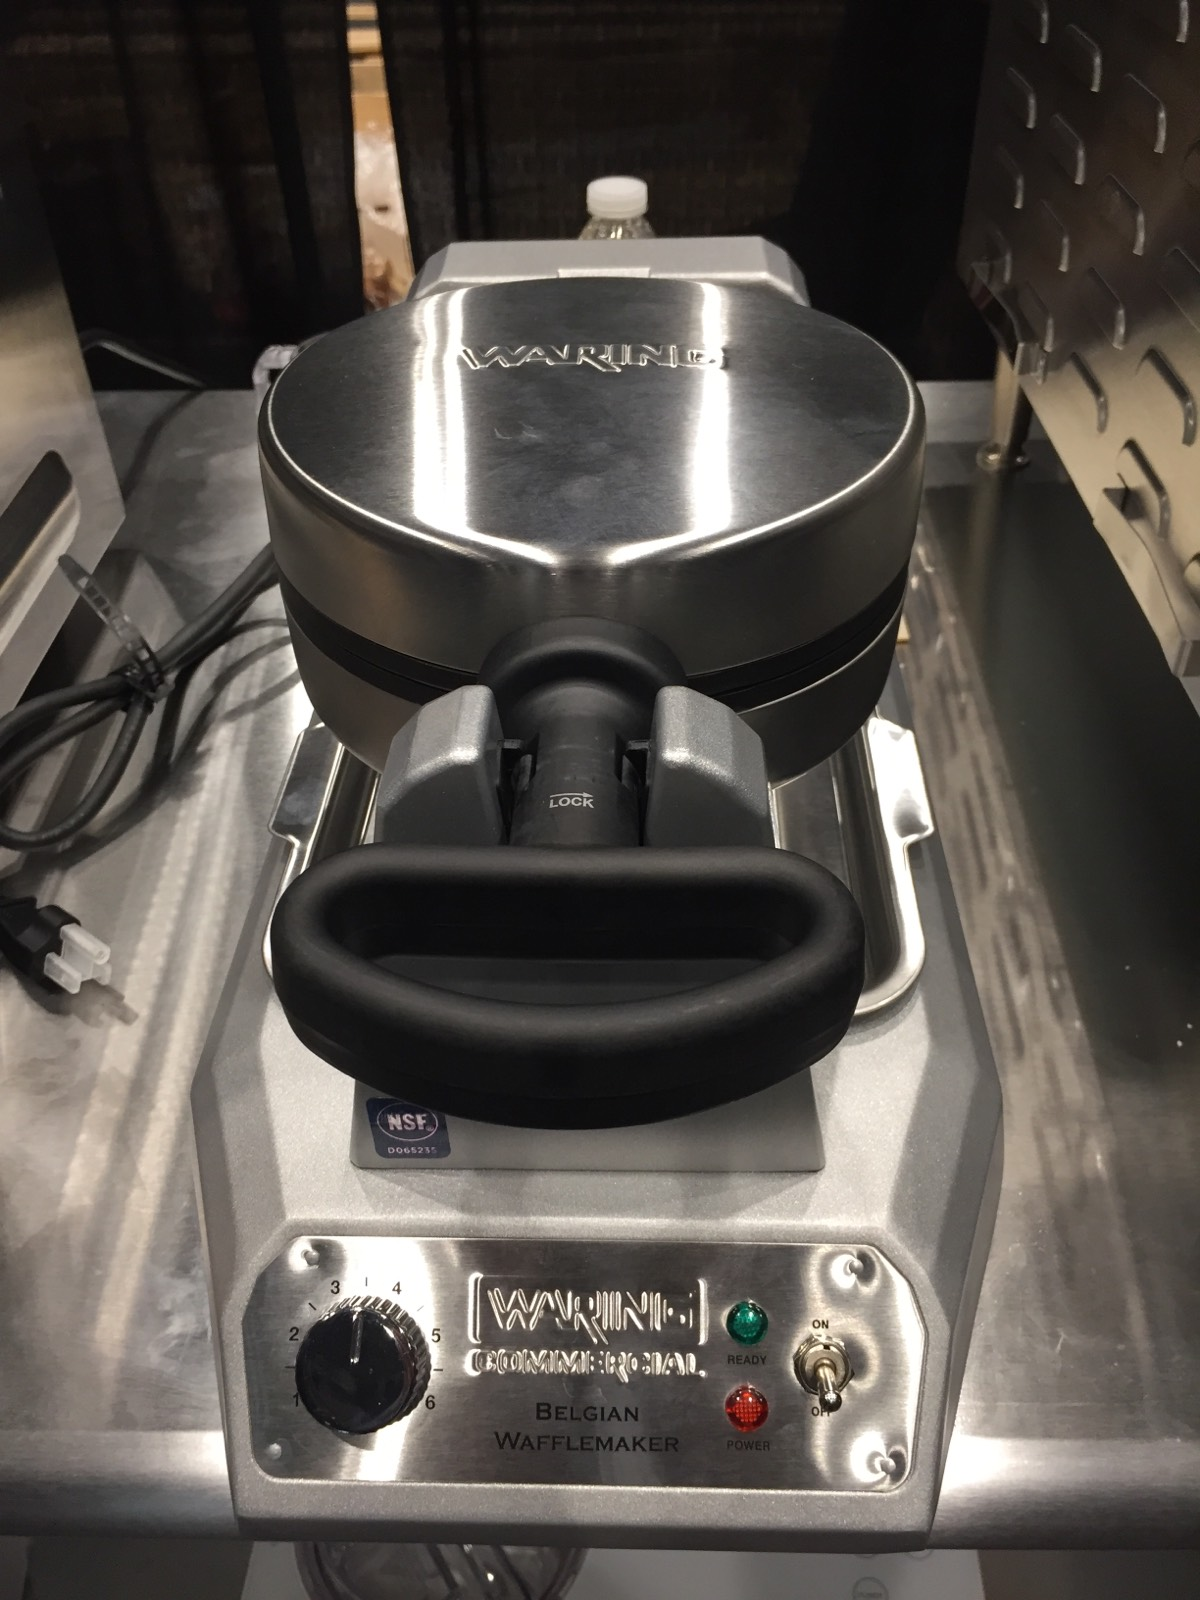 Commercial grade waffle maker (Waring)